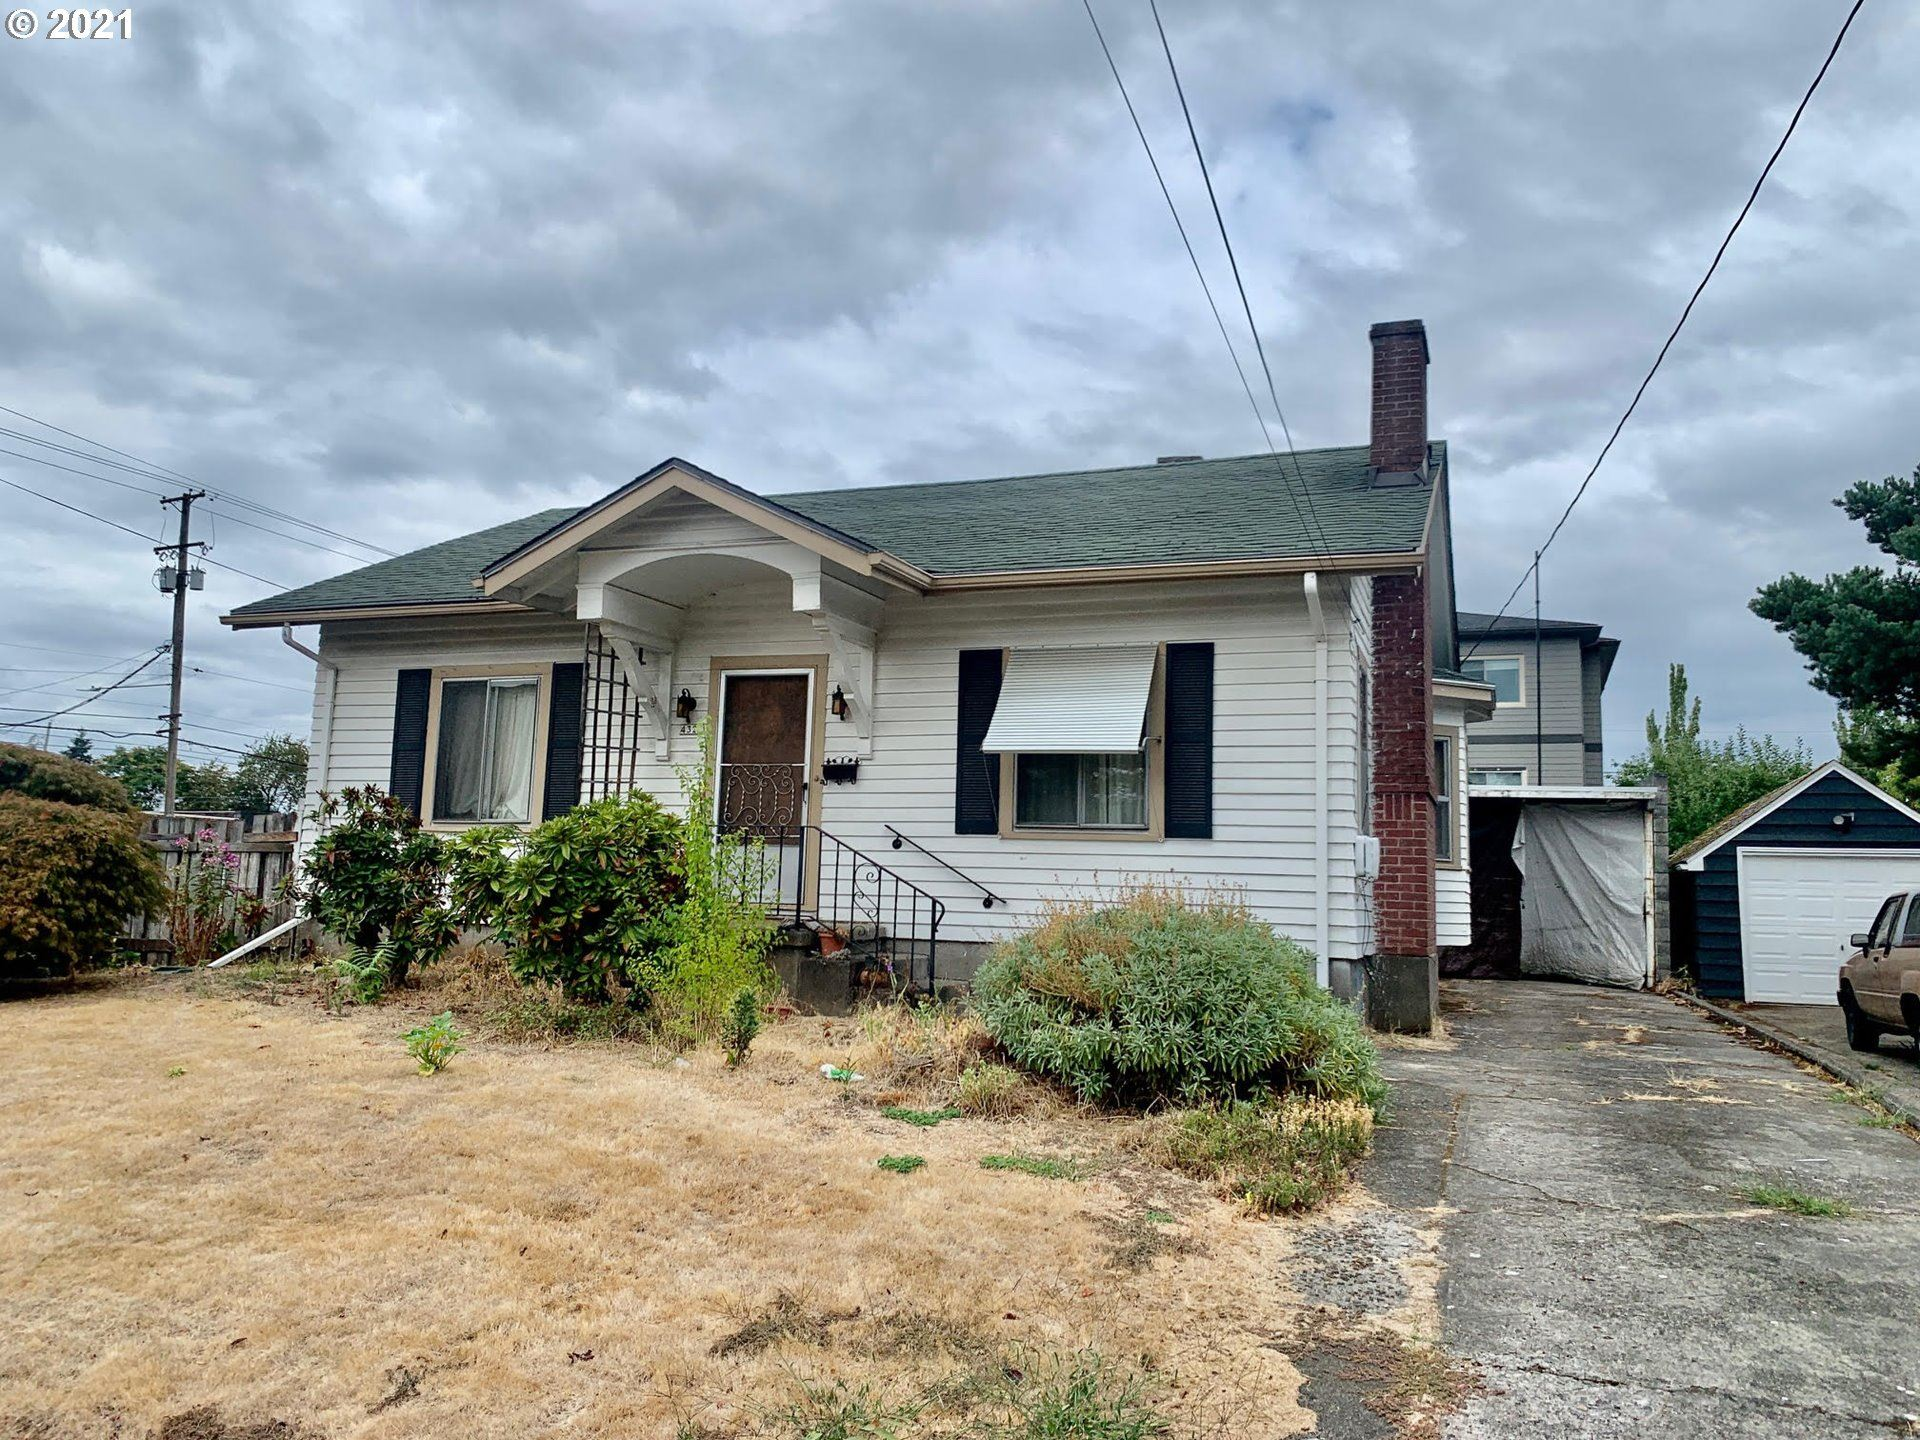 432 NE 73RD AVE, Portland, OR 97213 - #: 21128313